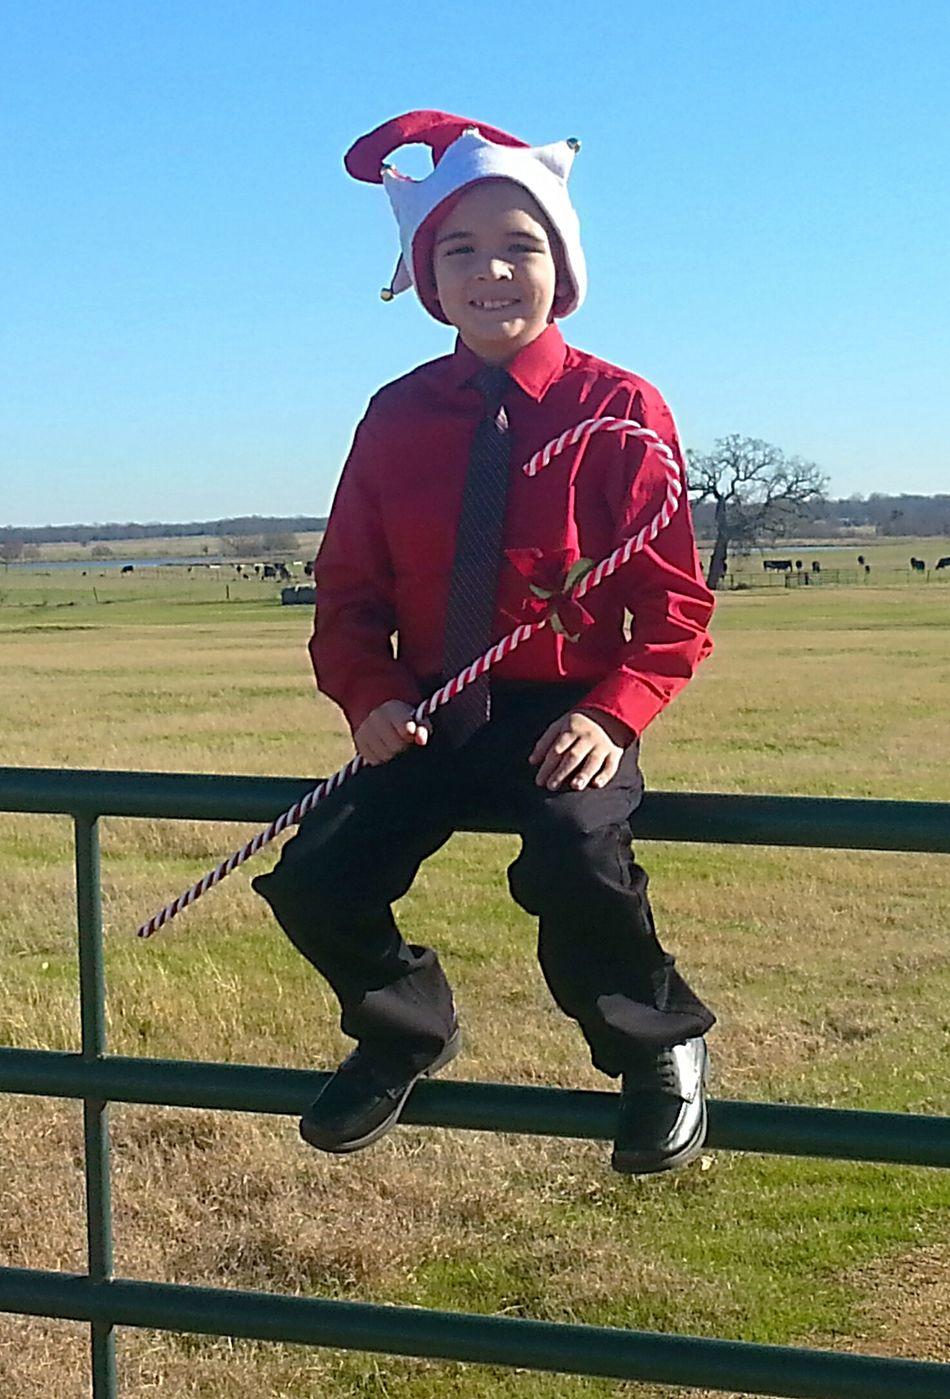 My grandson. Merry Christmas from Texas. Texas Christmas Chrstmas:)) Merrychristmas❄️ Christmas Time I Love My Grandson Happy Holidays!